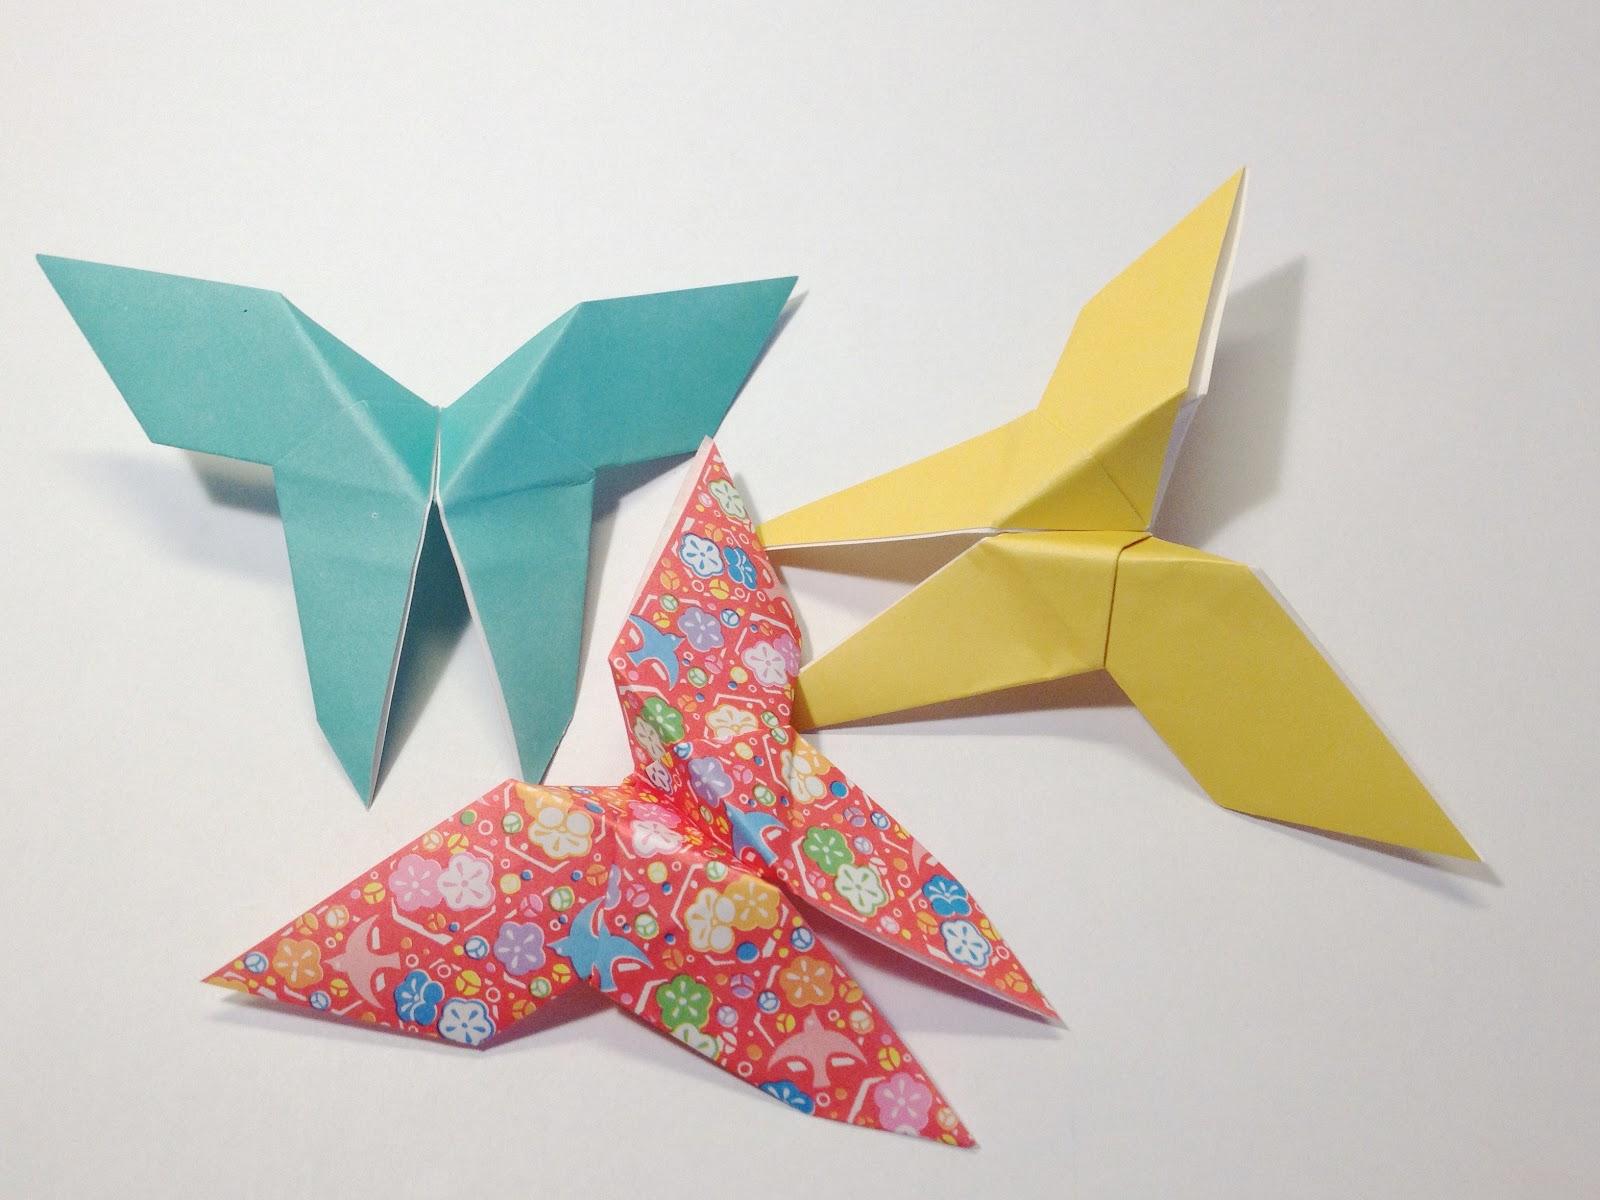 schaeresteipapier origami schmetterlinge. Black Bedroom Furniture Sets. Home Design Ideas